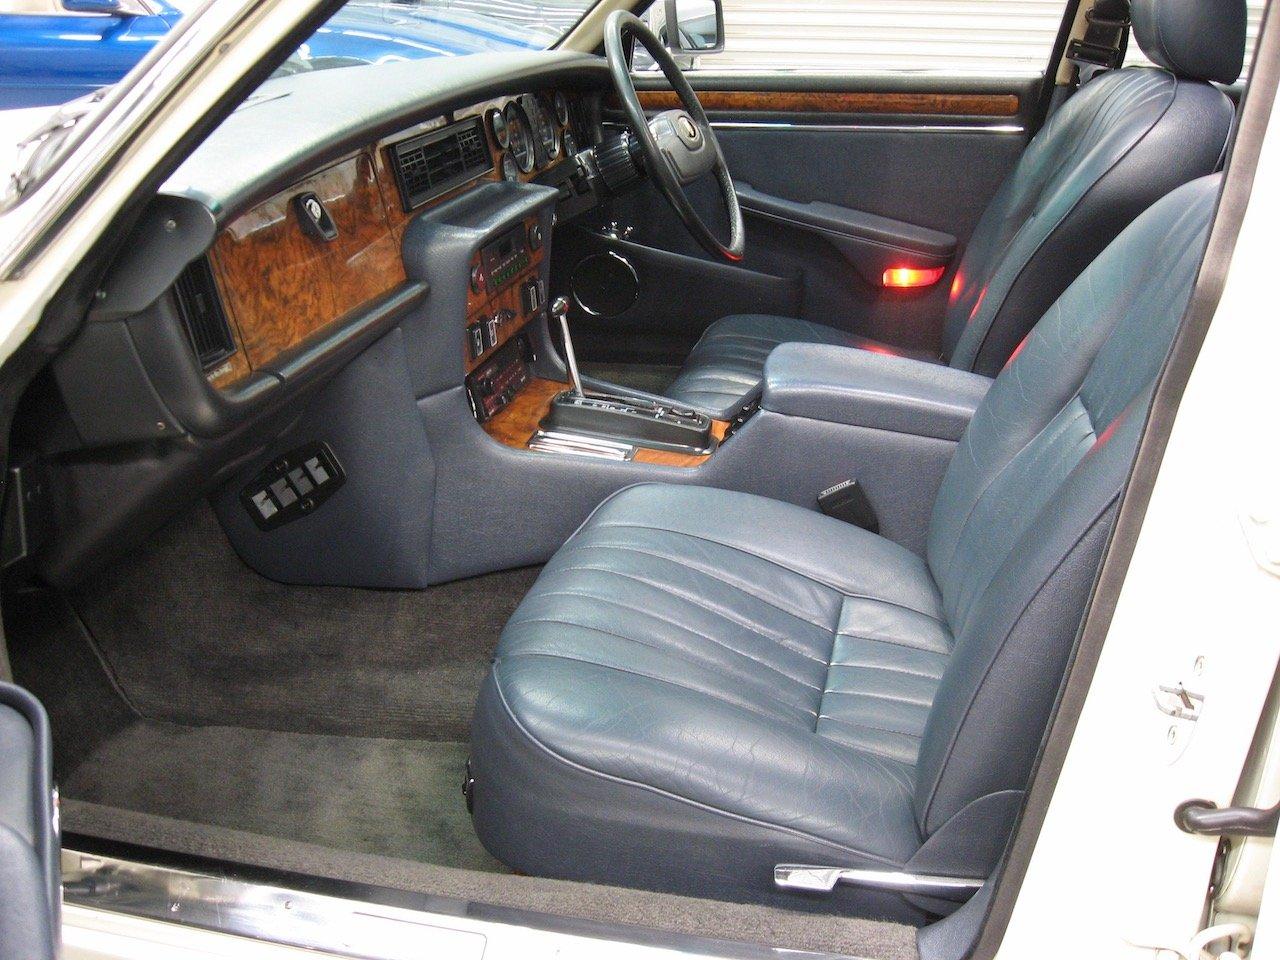 1988 Jaguar XJ12 Series 3 V12 Sovereign For Sale (picture 5 of 6)